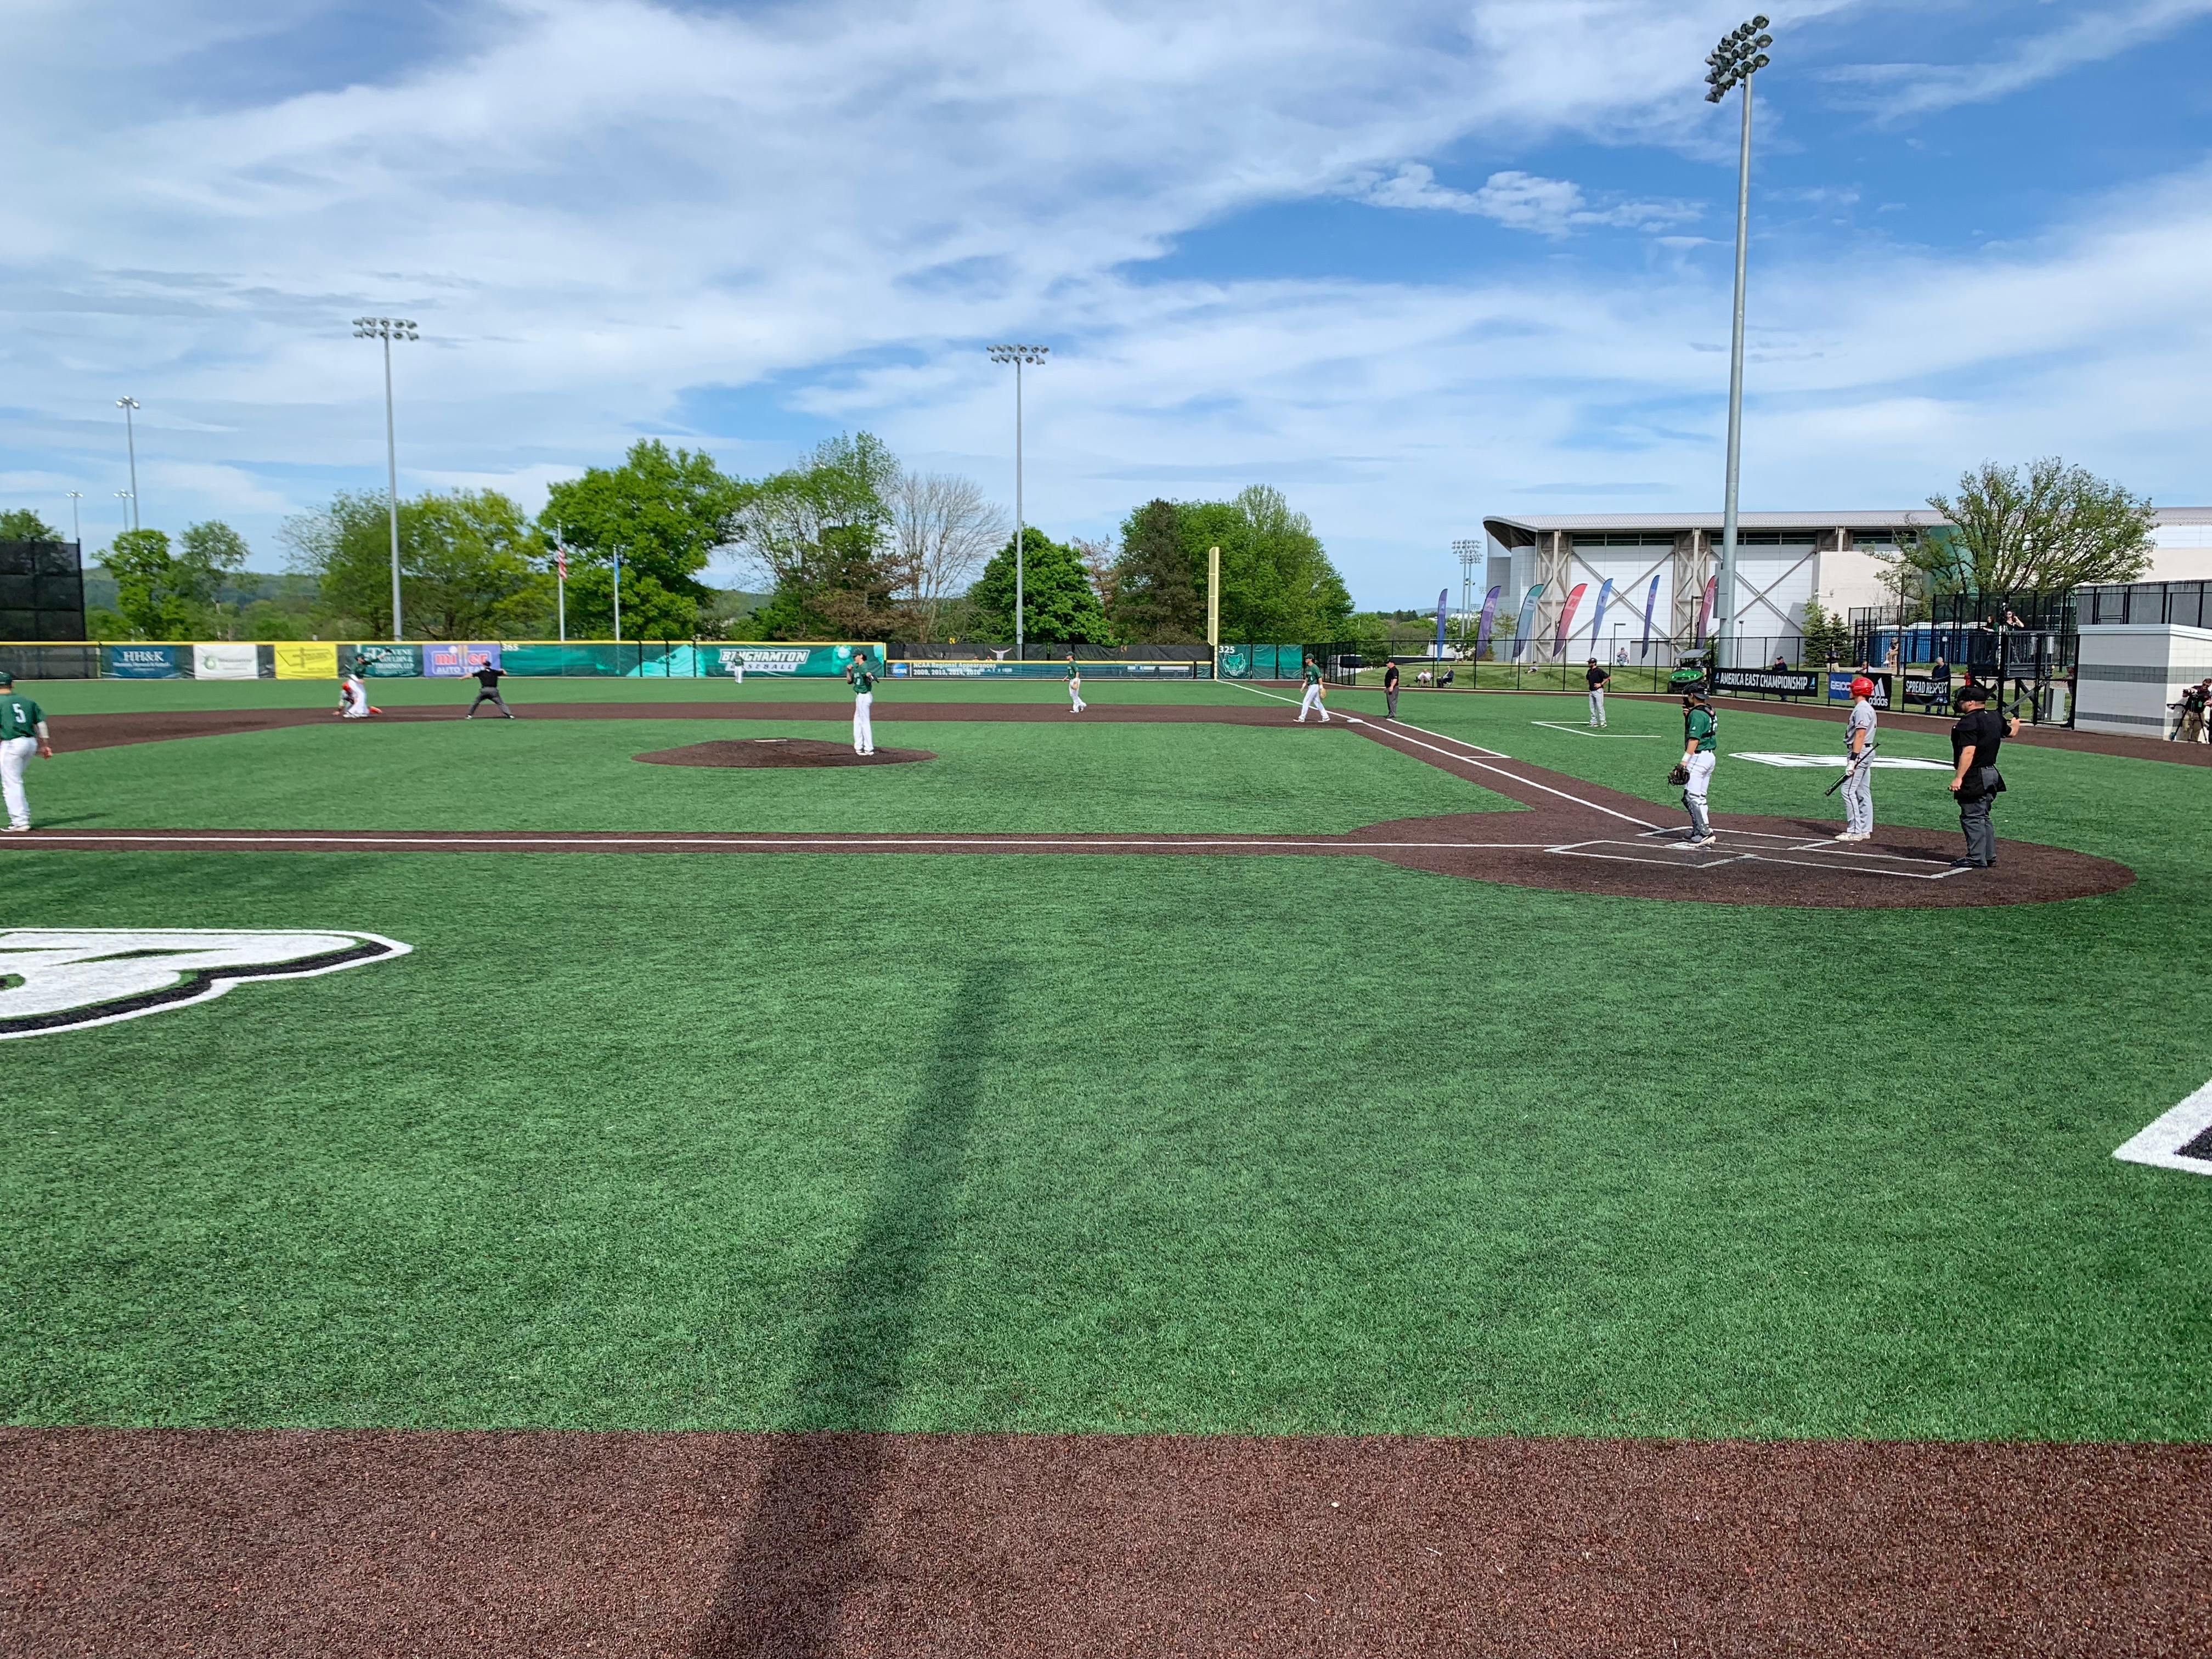 Top 10 Sports Teams at Binghamton University